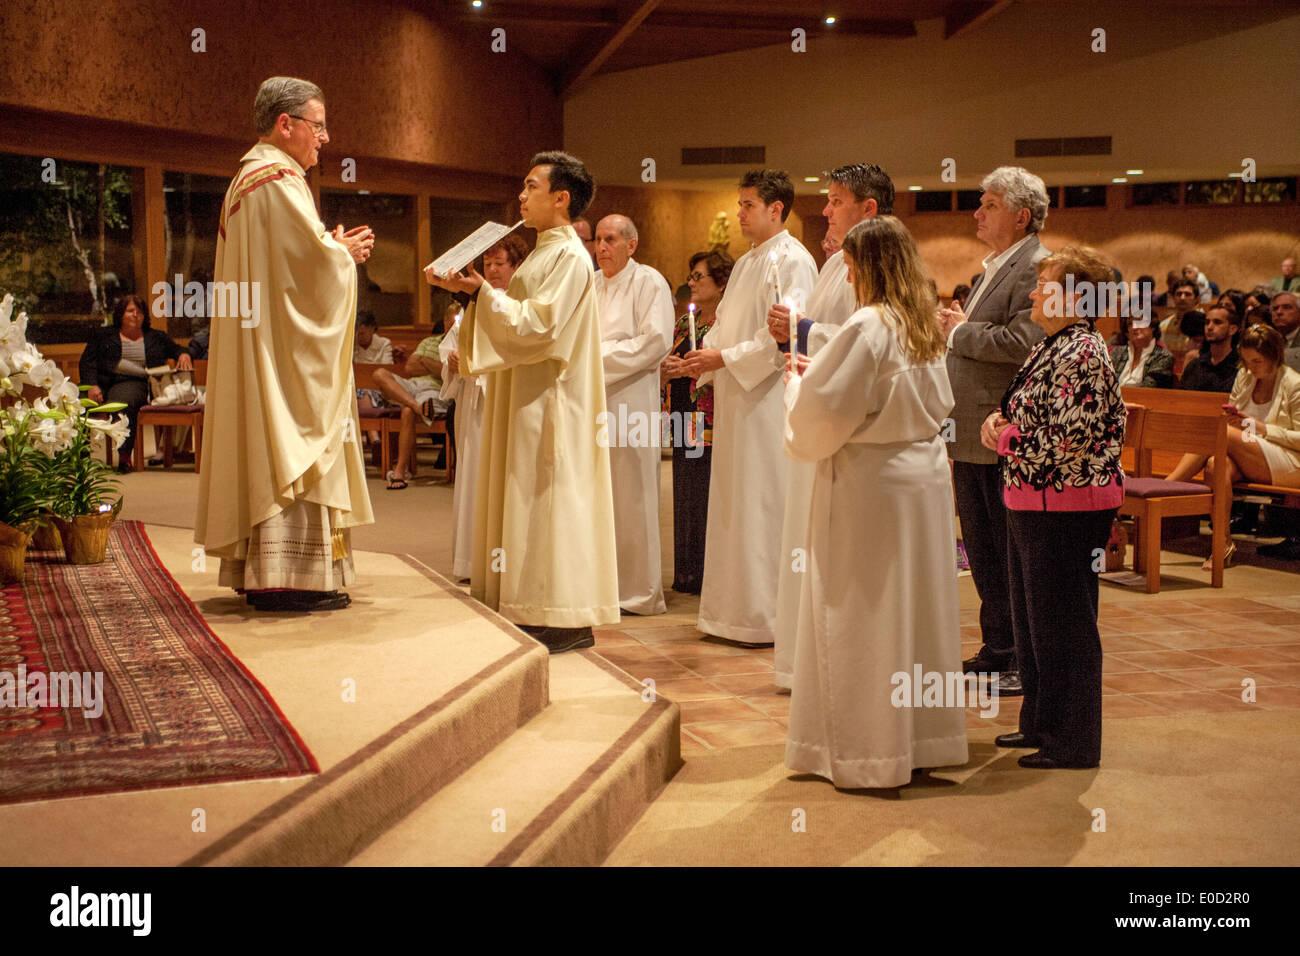 The pastor of St  Timothy's Catholic Church, Laguna Niguel, CA